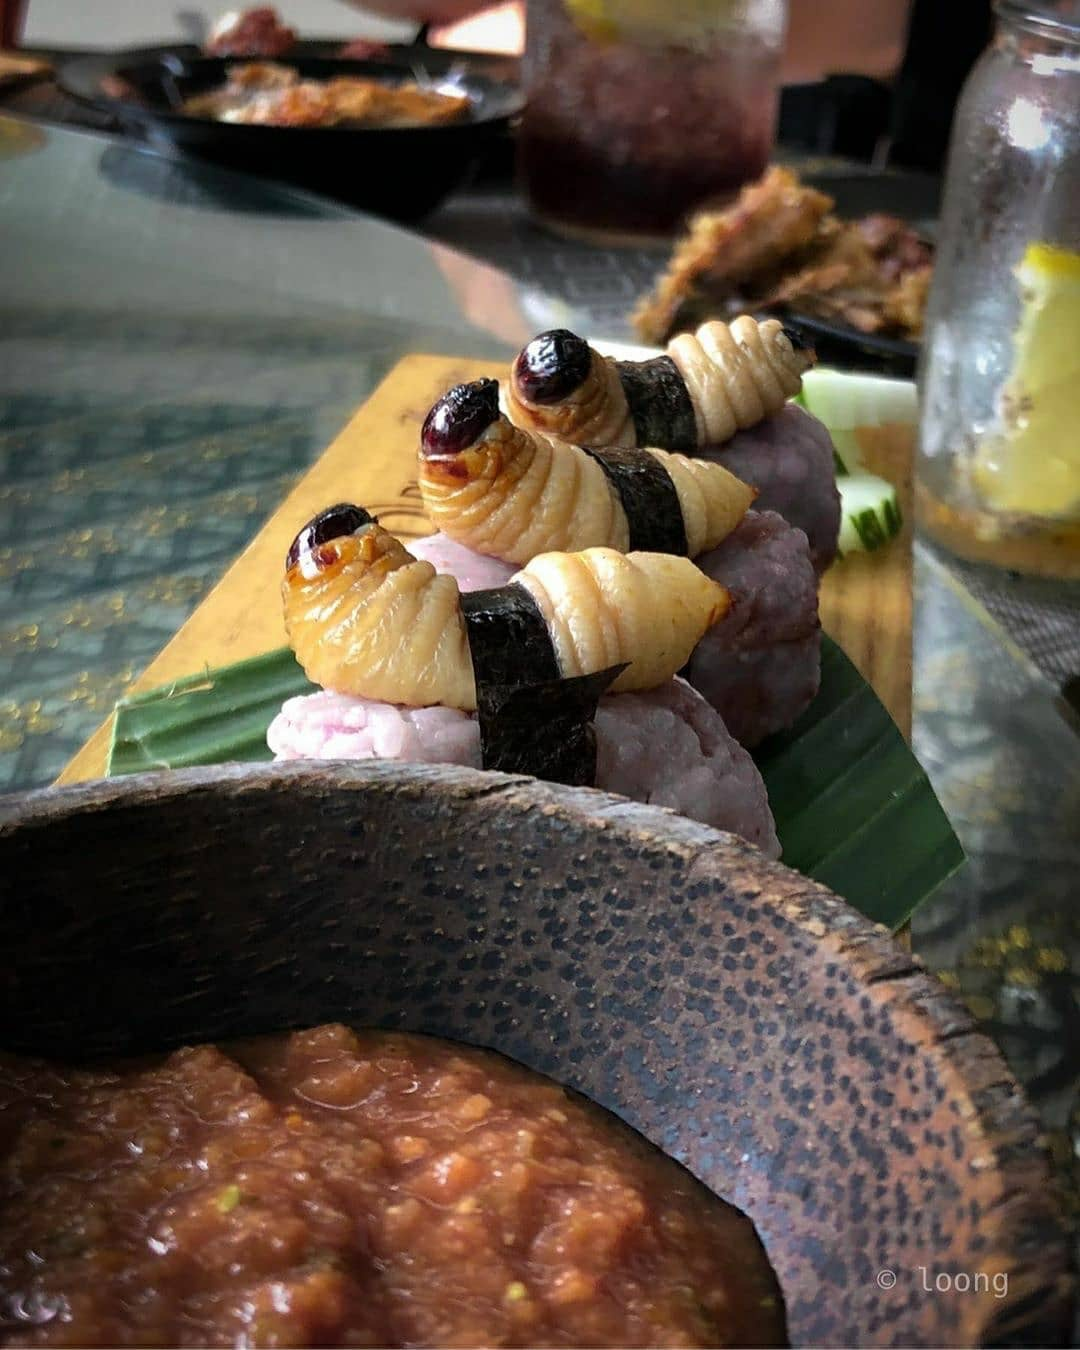 Kham pha mon sushi duong dua ky la o Malaysia hinh anh 6 IMG_4228.JPG